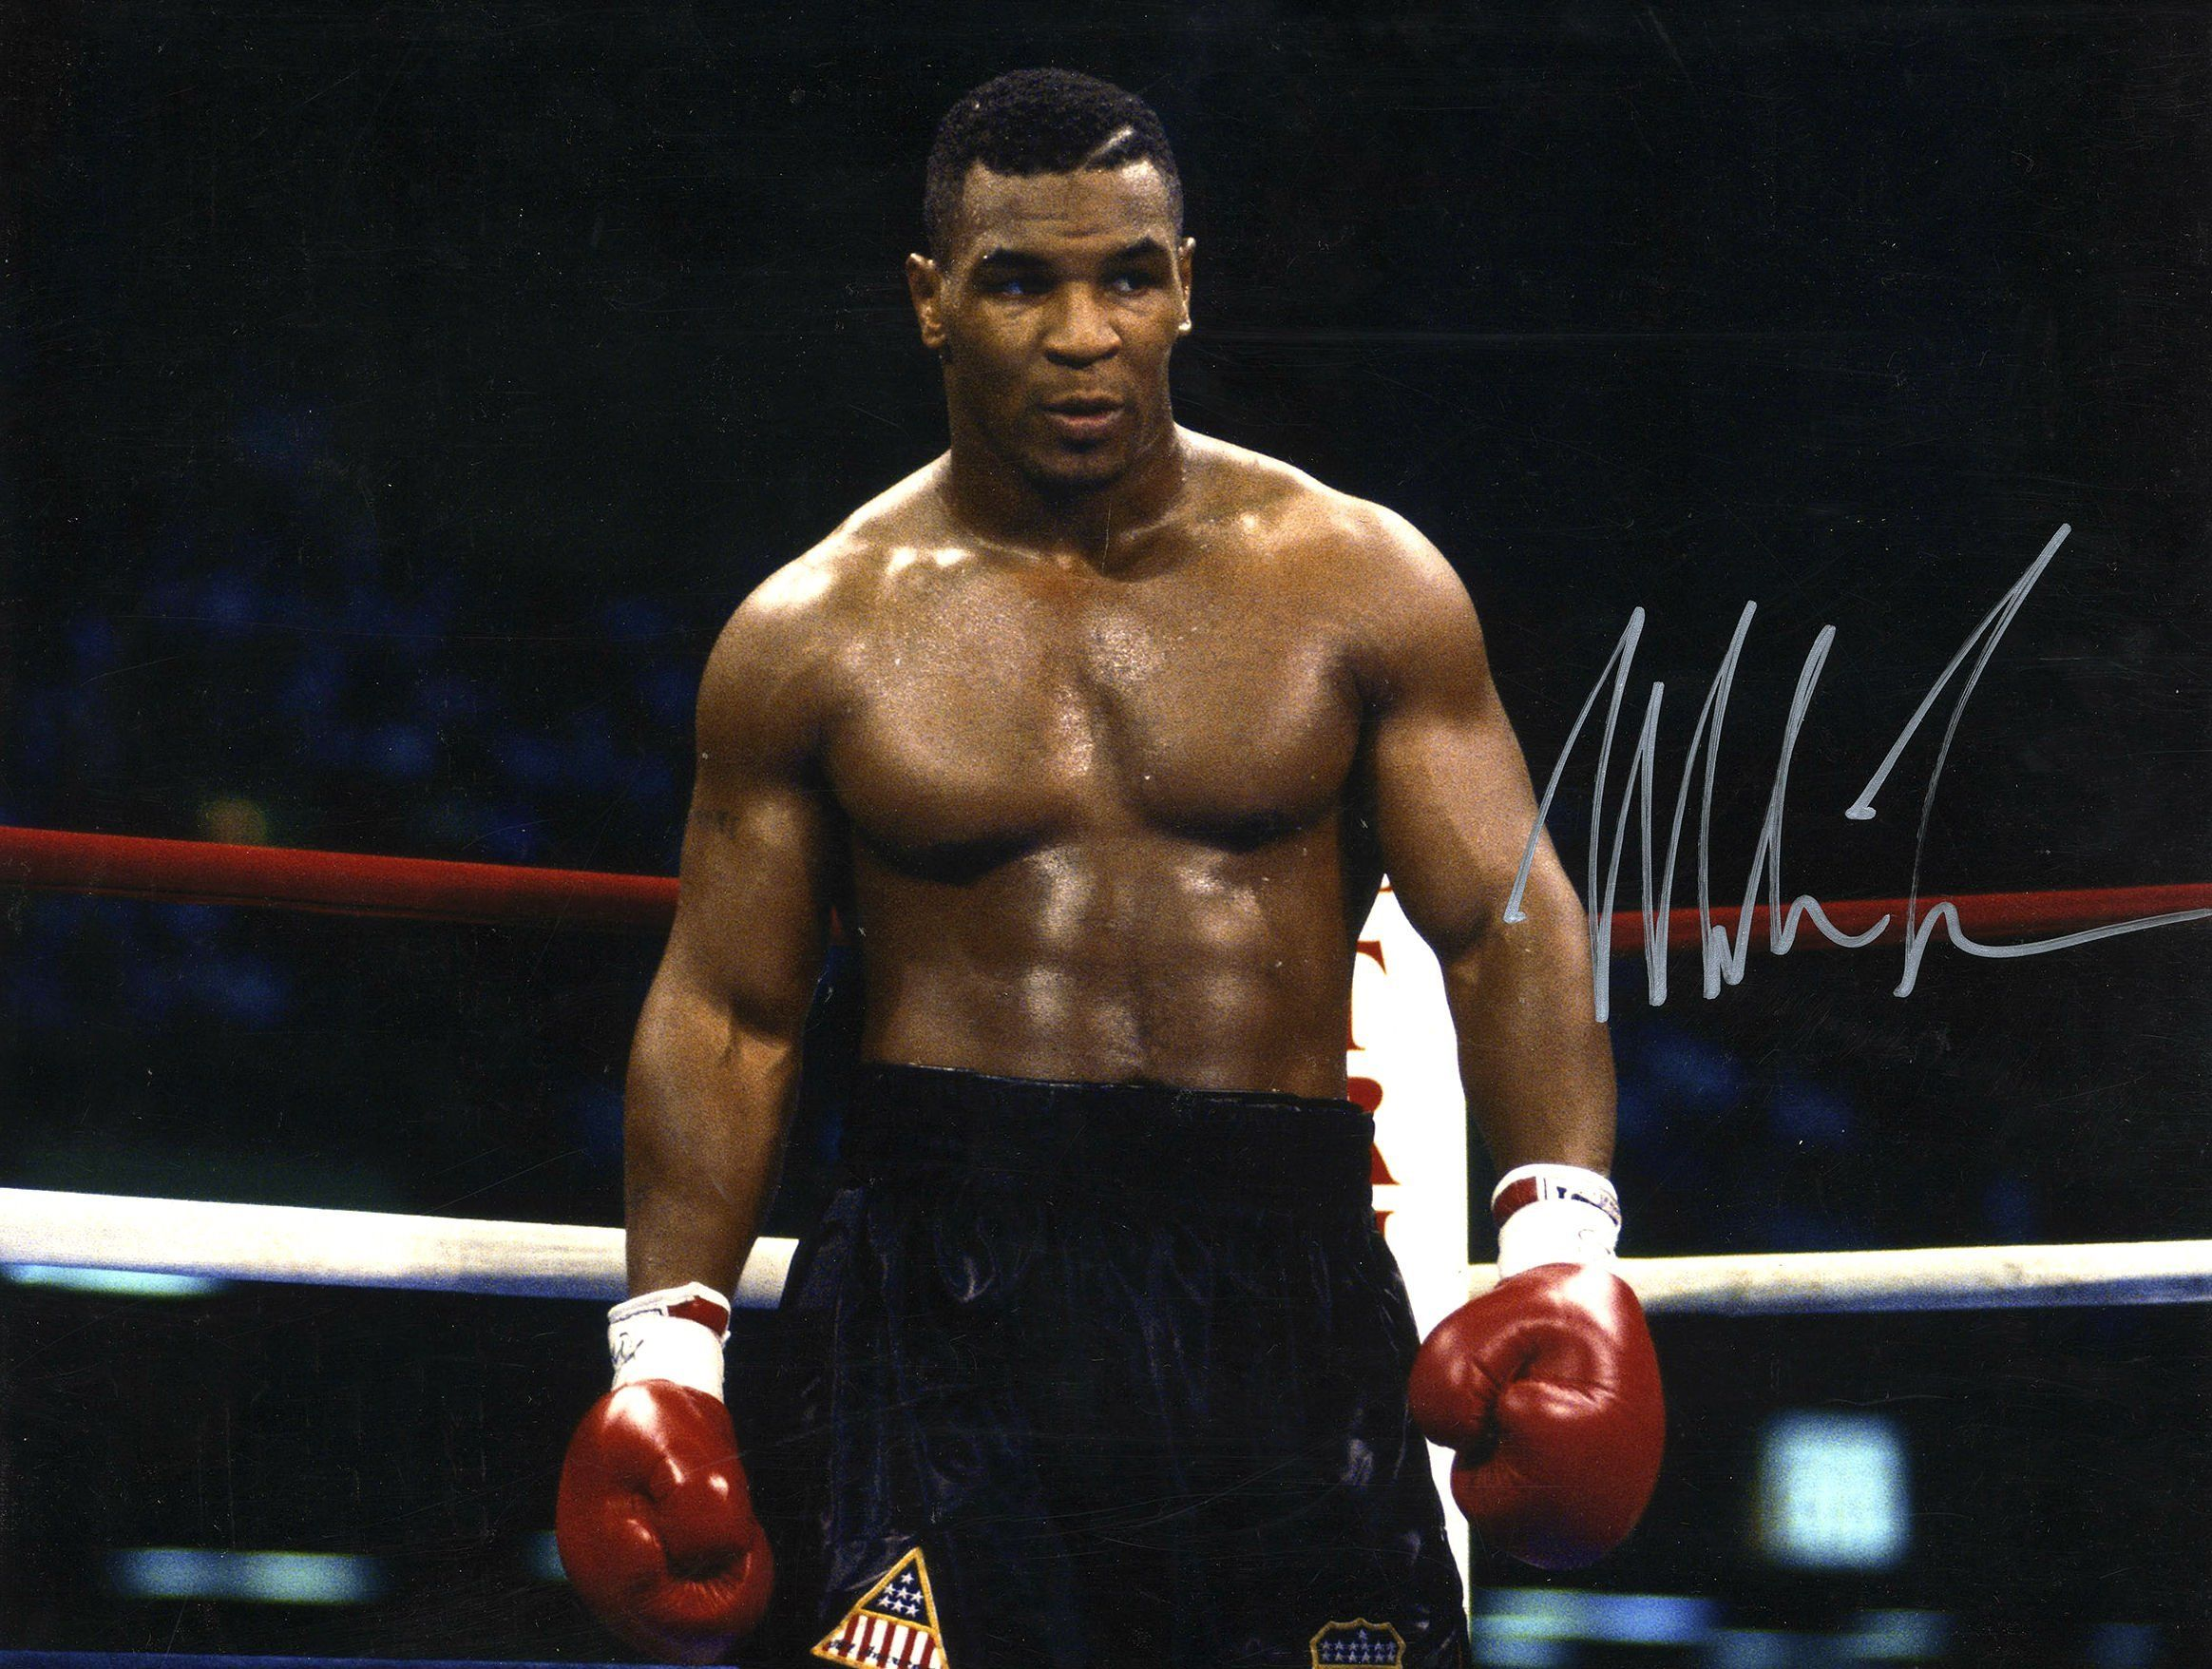 Boxing Mike Tyson Knockout Wallpapers Desktop Background Boxeo Mike Tyson Entrenamiento De Abdominales